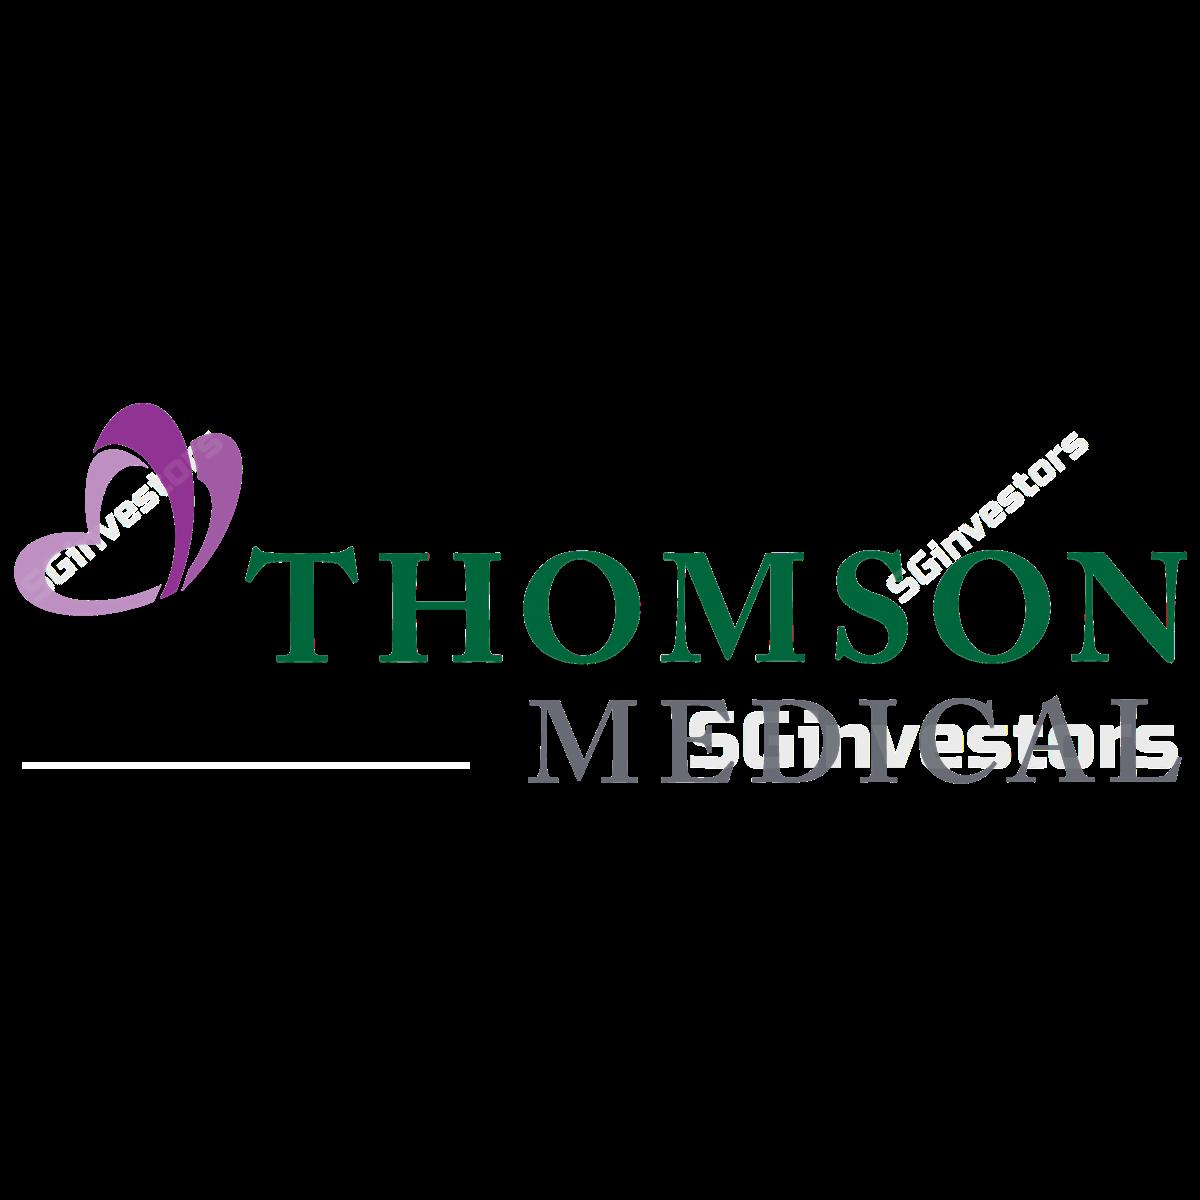 THOMSON MEDICAL GROUP LIMITED (SGX:A50) | SGinvestors.io